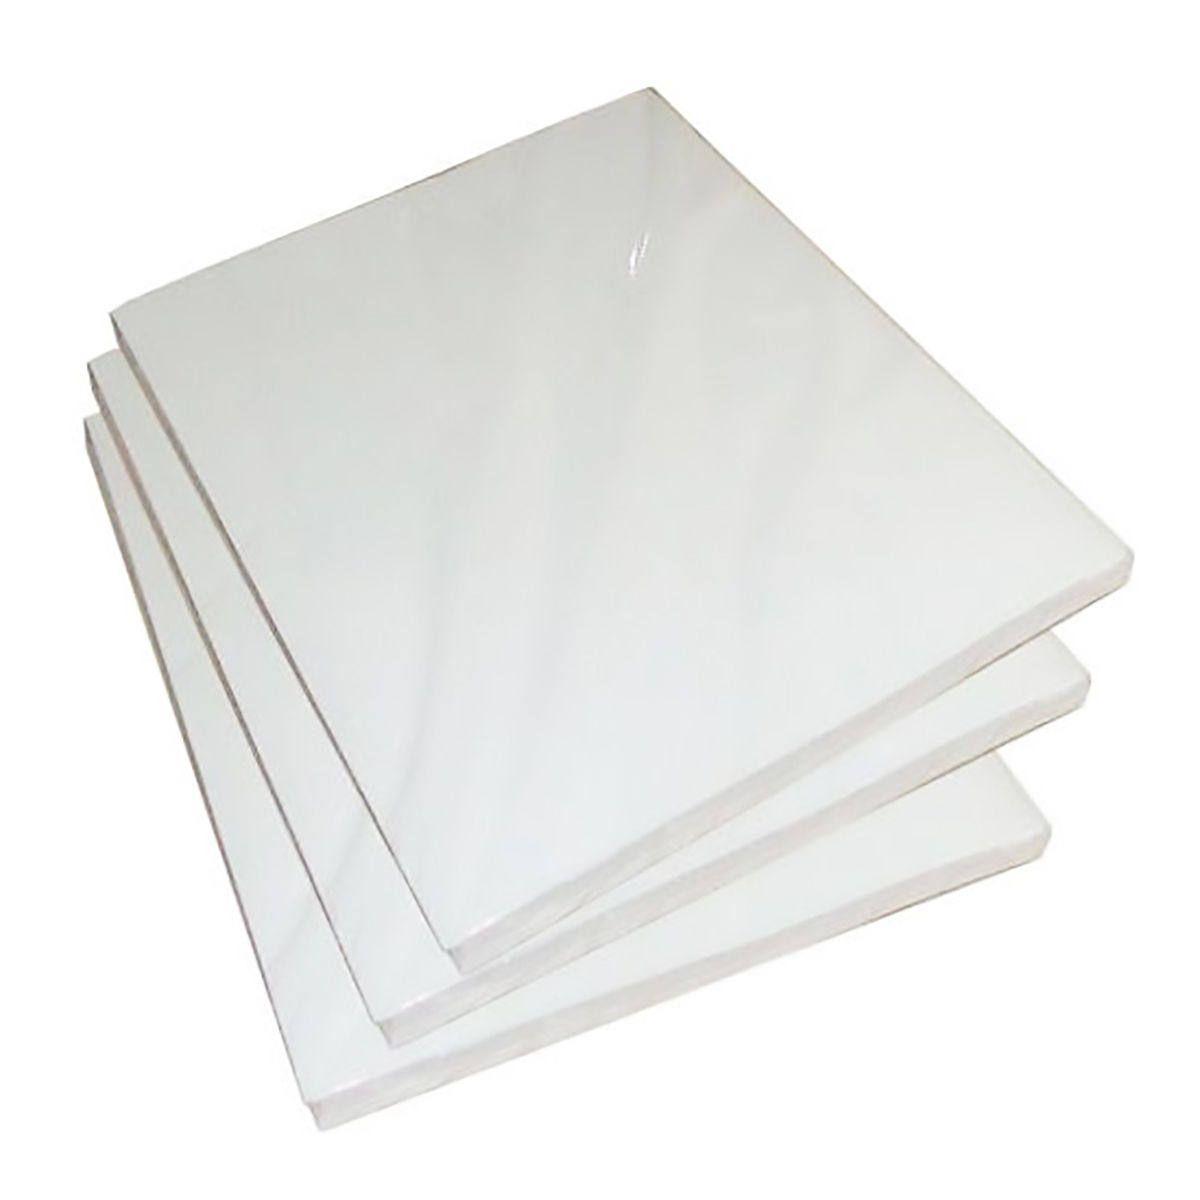 Papel Dupla Face Fotográfico 120g A4 Glossy Branco Brilhante Resistente à Água / 200 Folhas